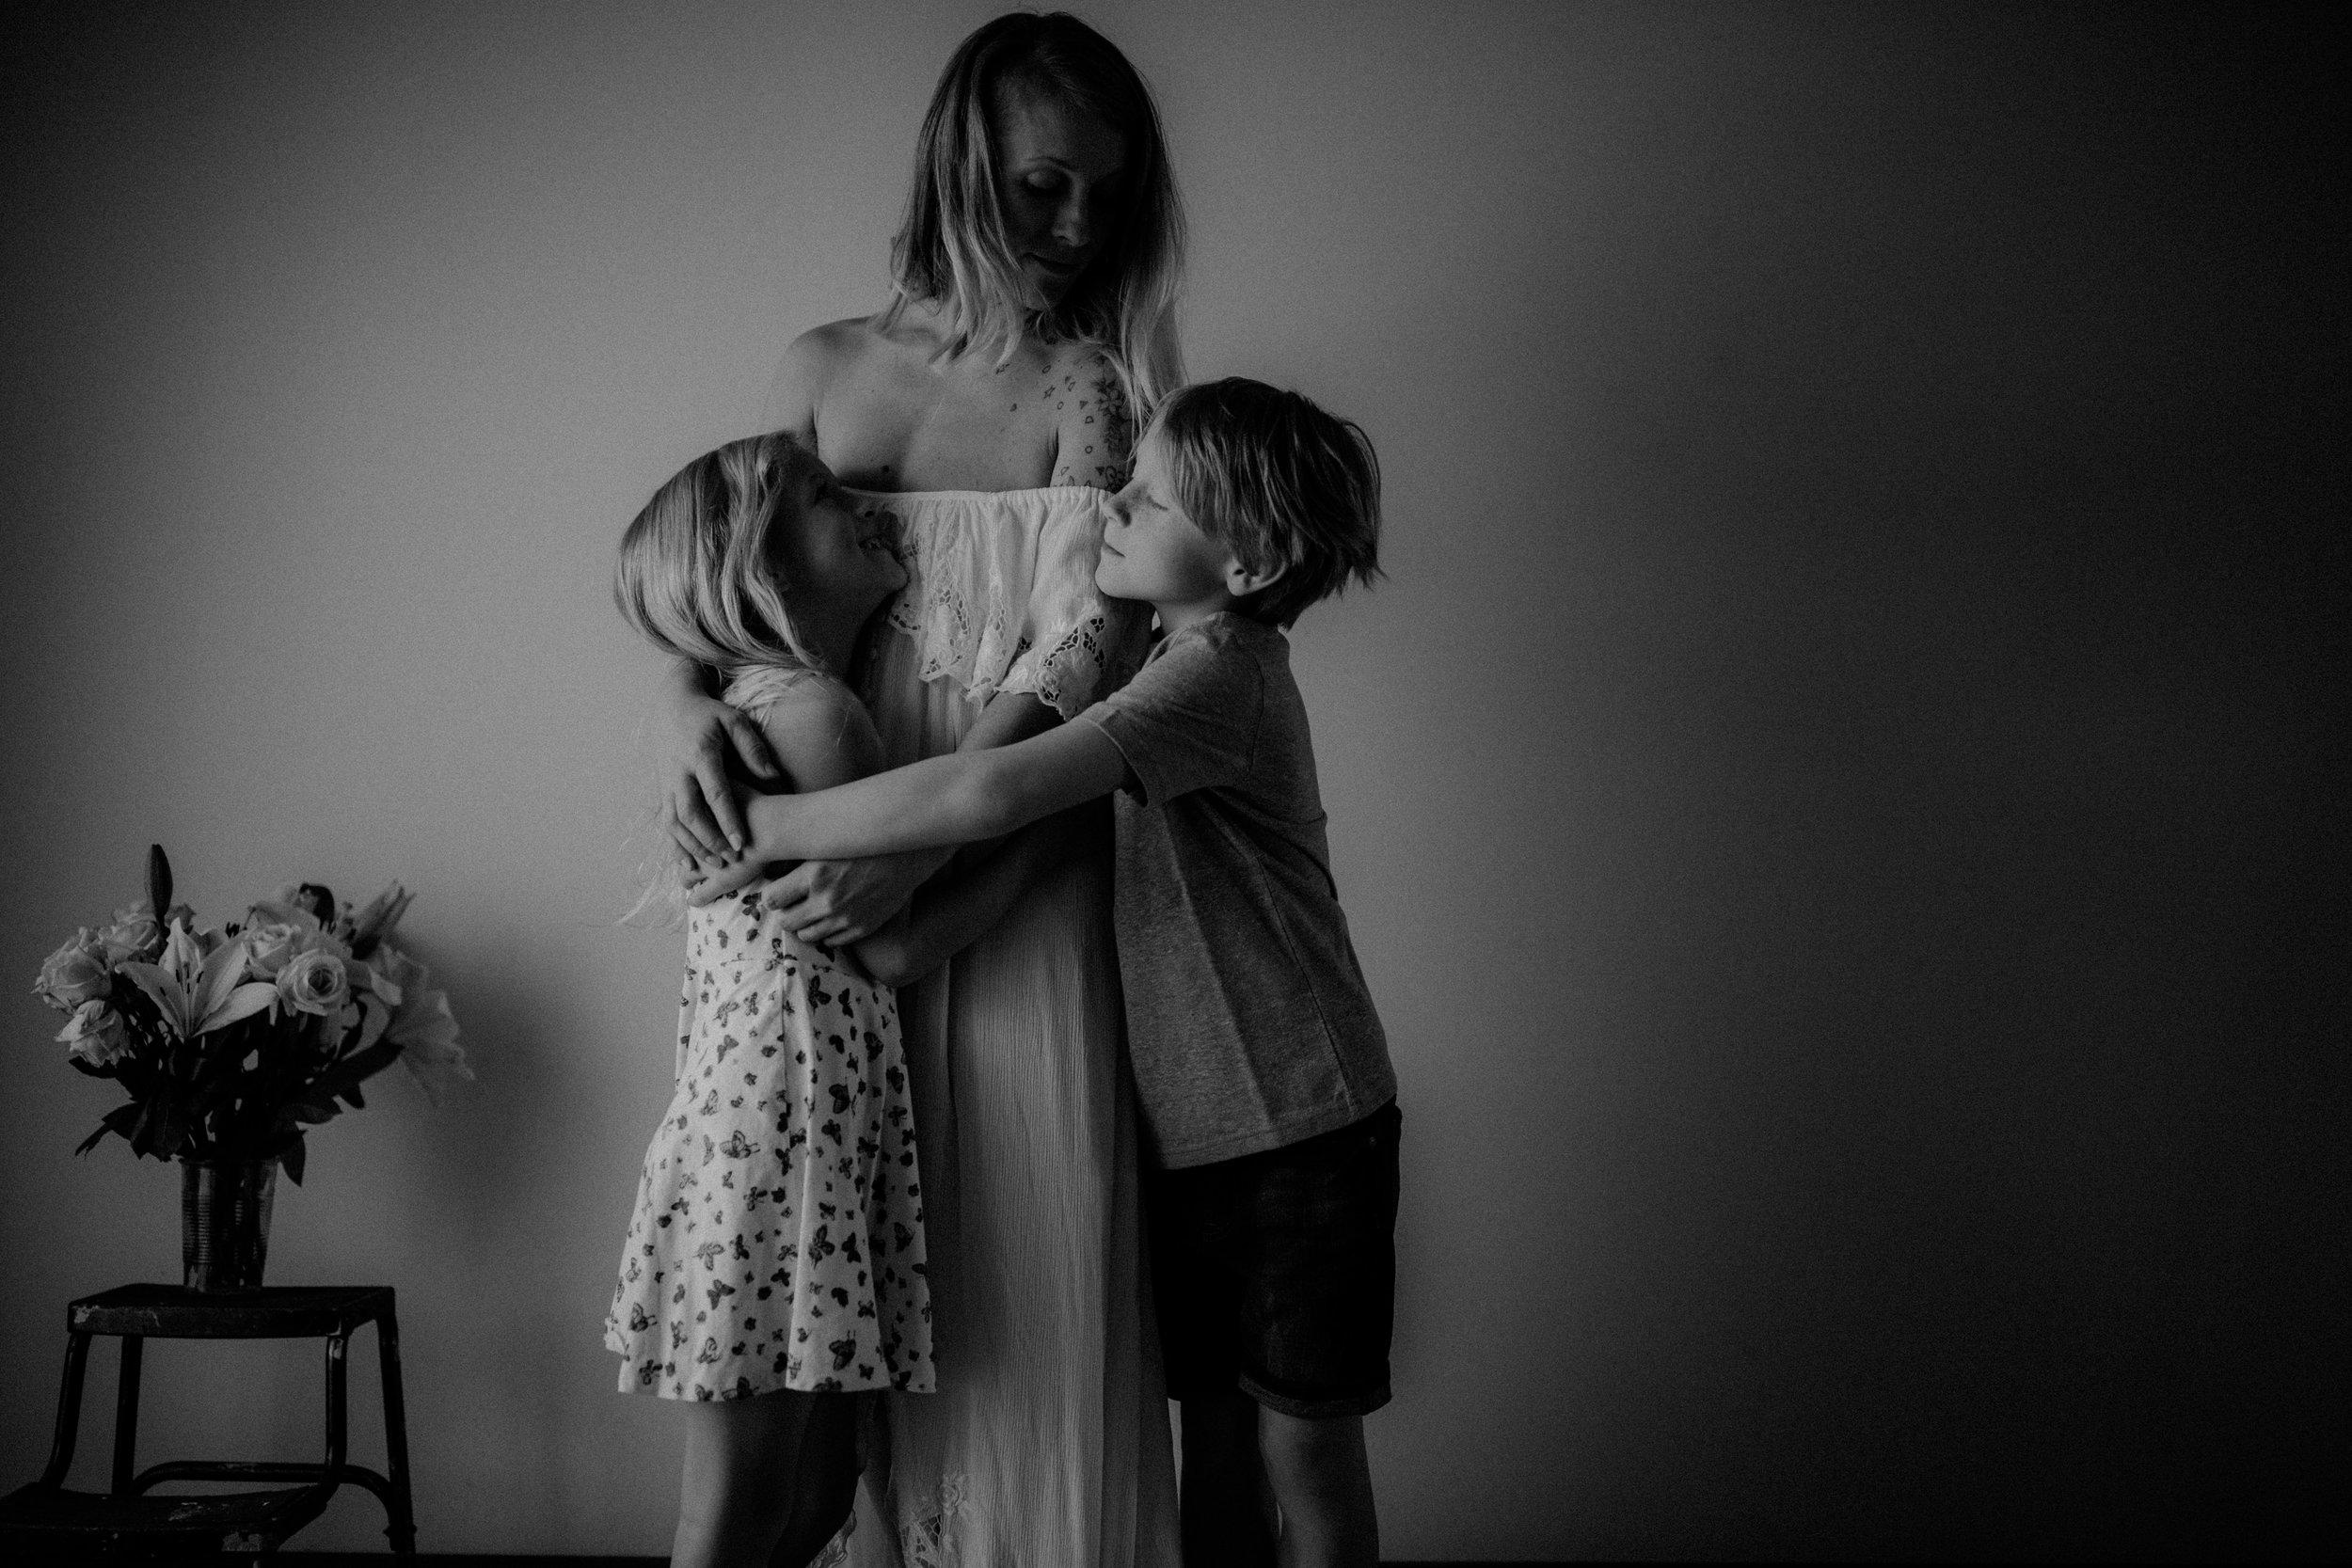 motherhood-self-portrait-11.jpg